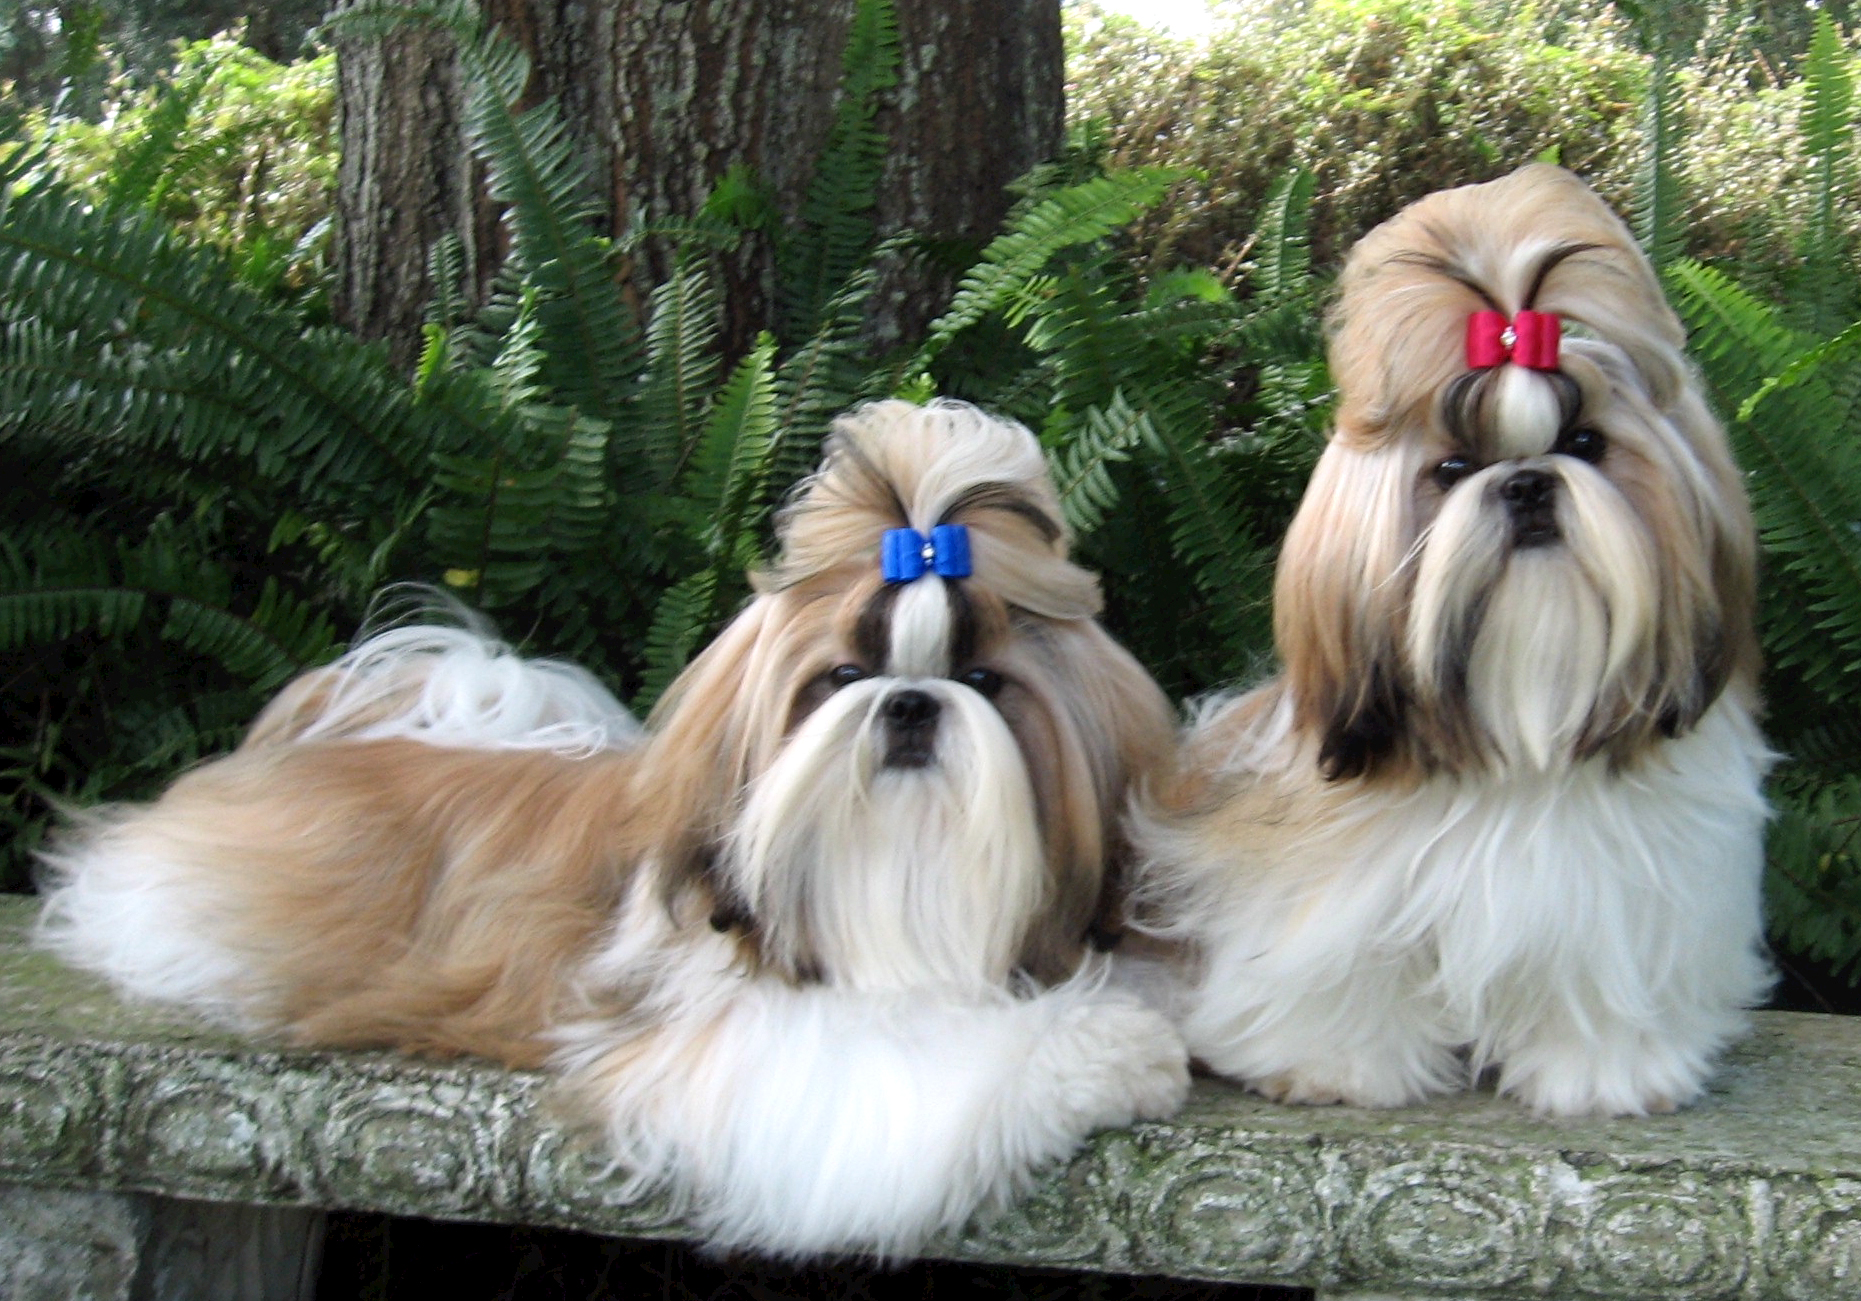 Cute Shih Tzu dogs wallpaper